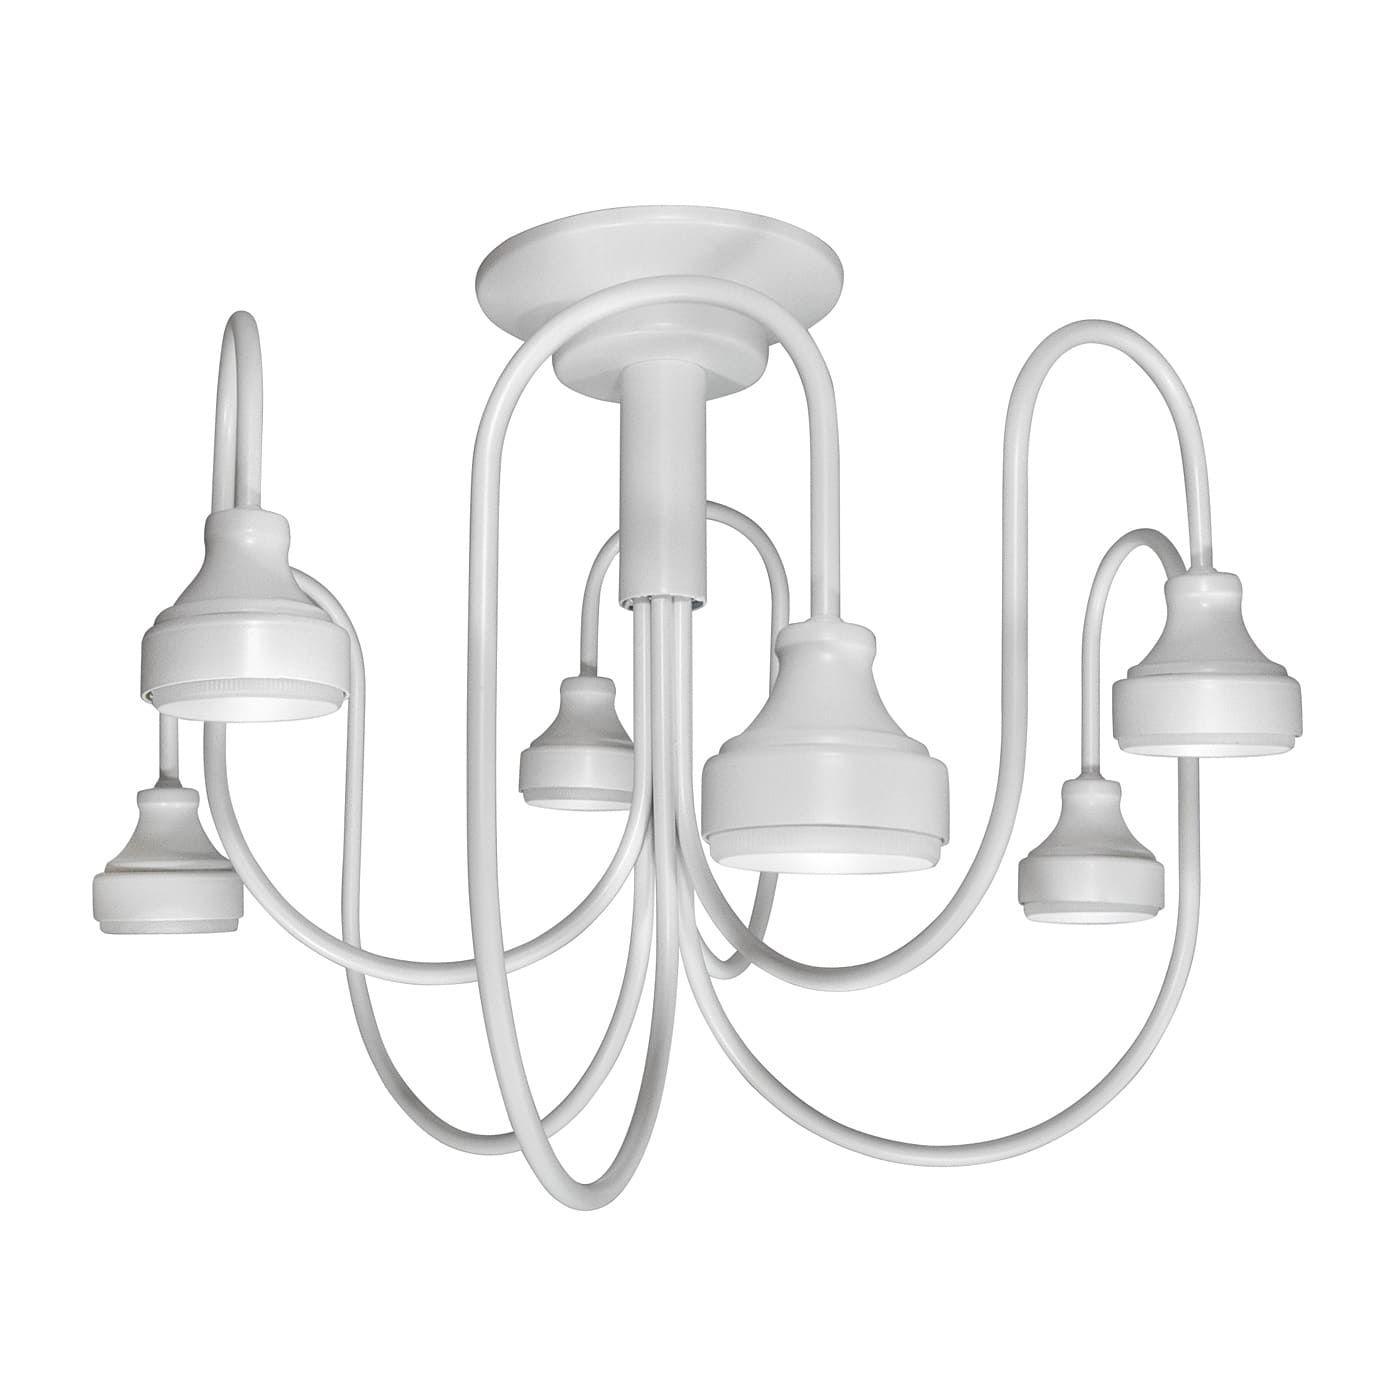 PETRASVET / Ceiling chandelier S2398-6, 6xGX53